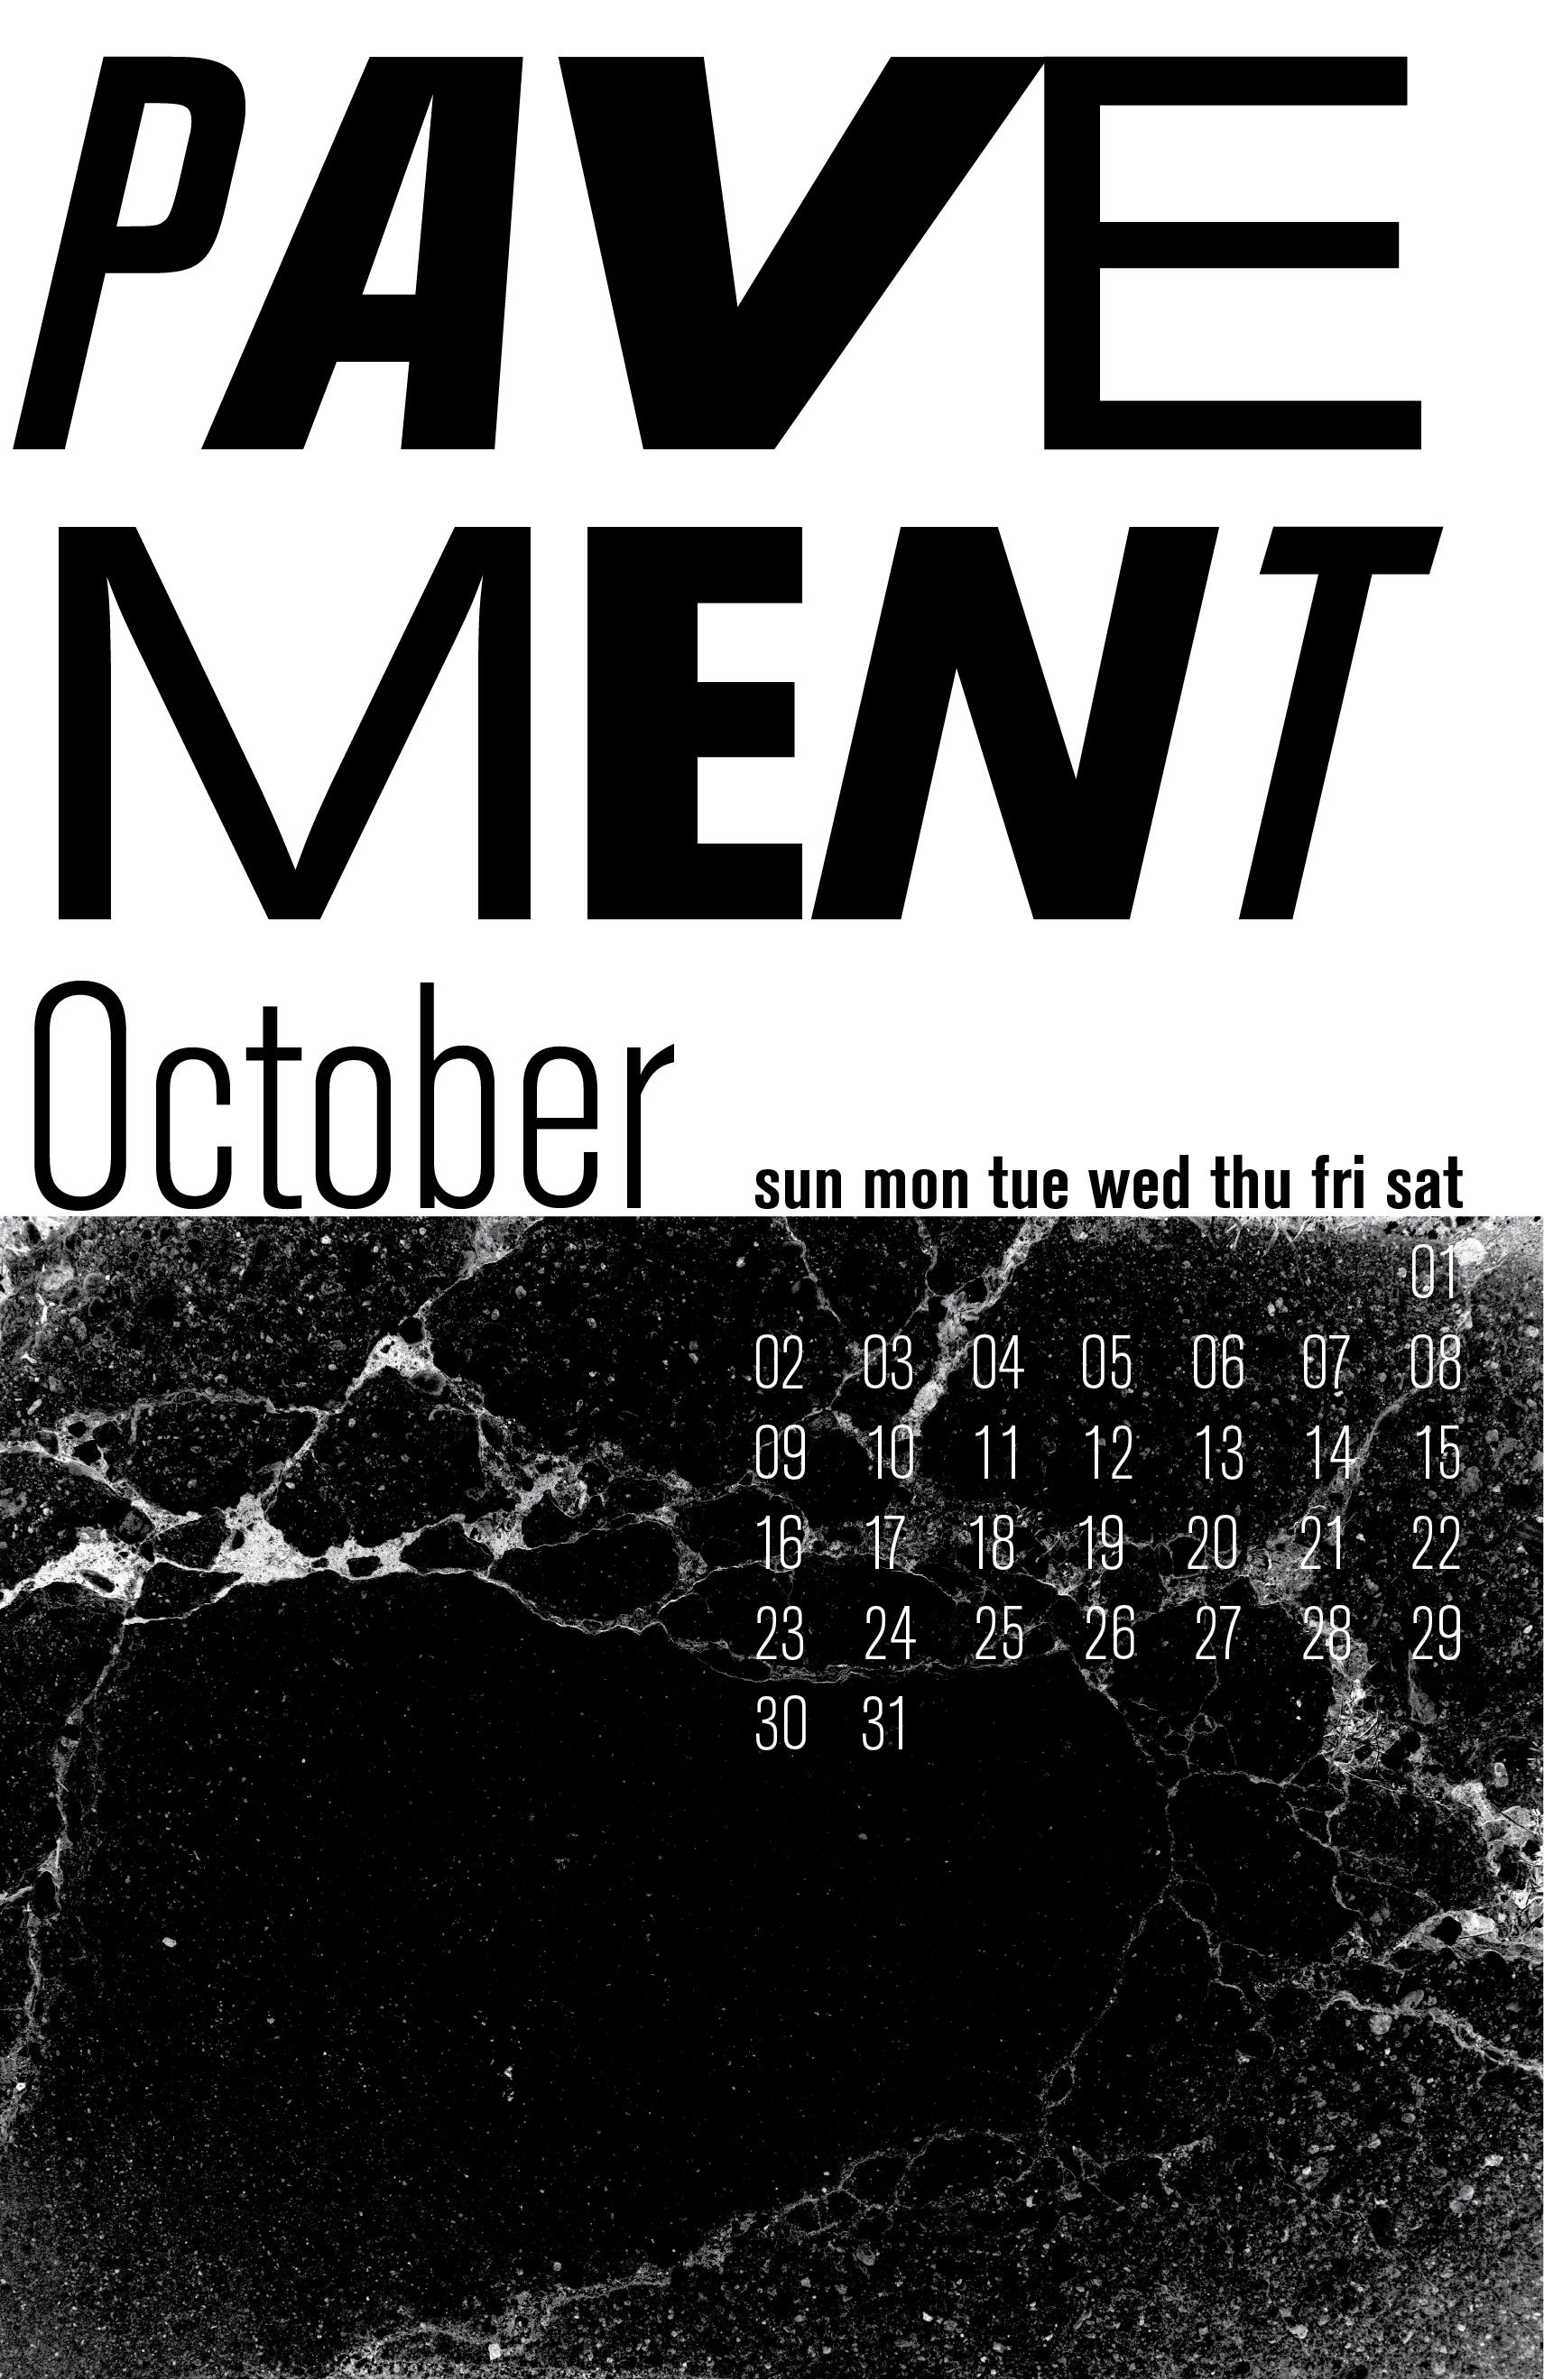 Keith Miller - 90's Alternative Calendar